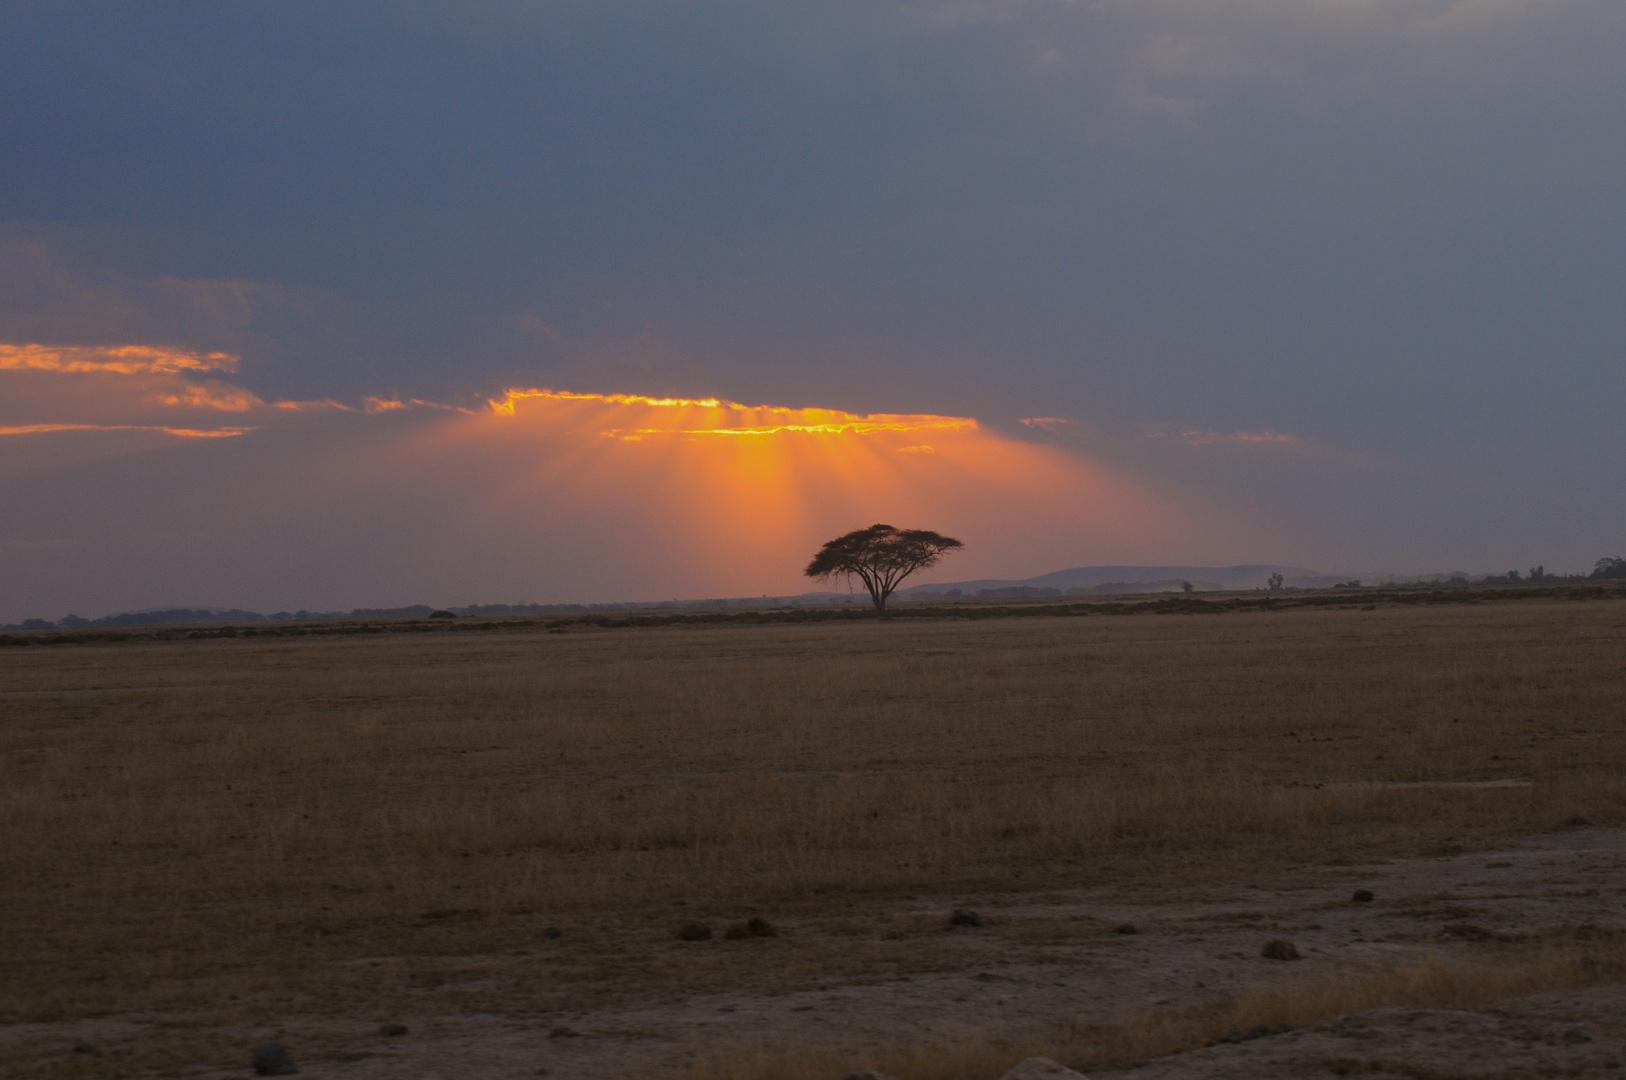 Dämmerung in Kenia